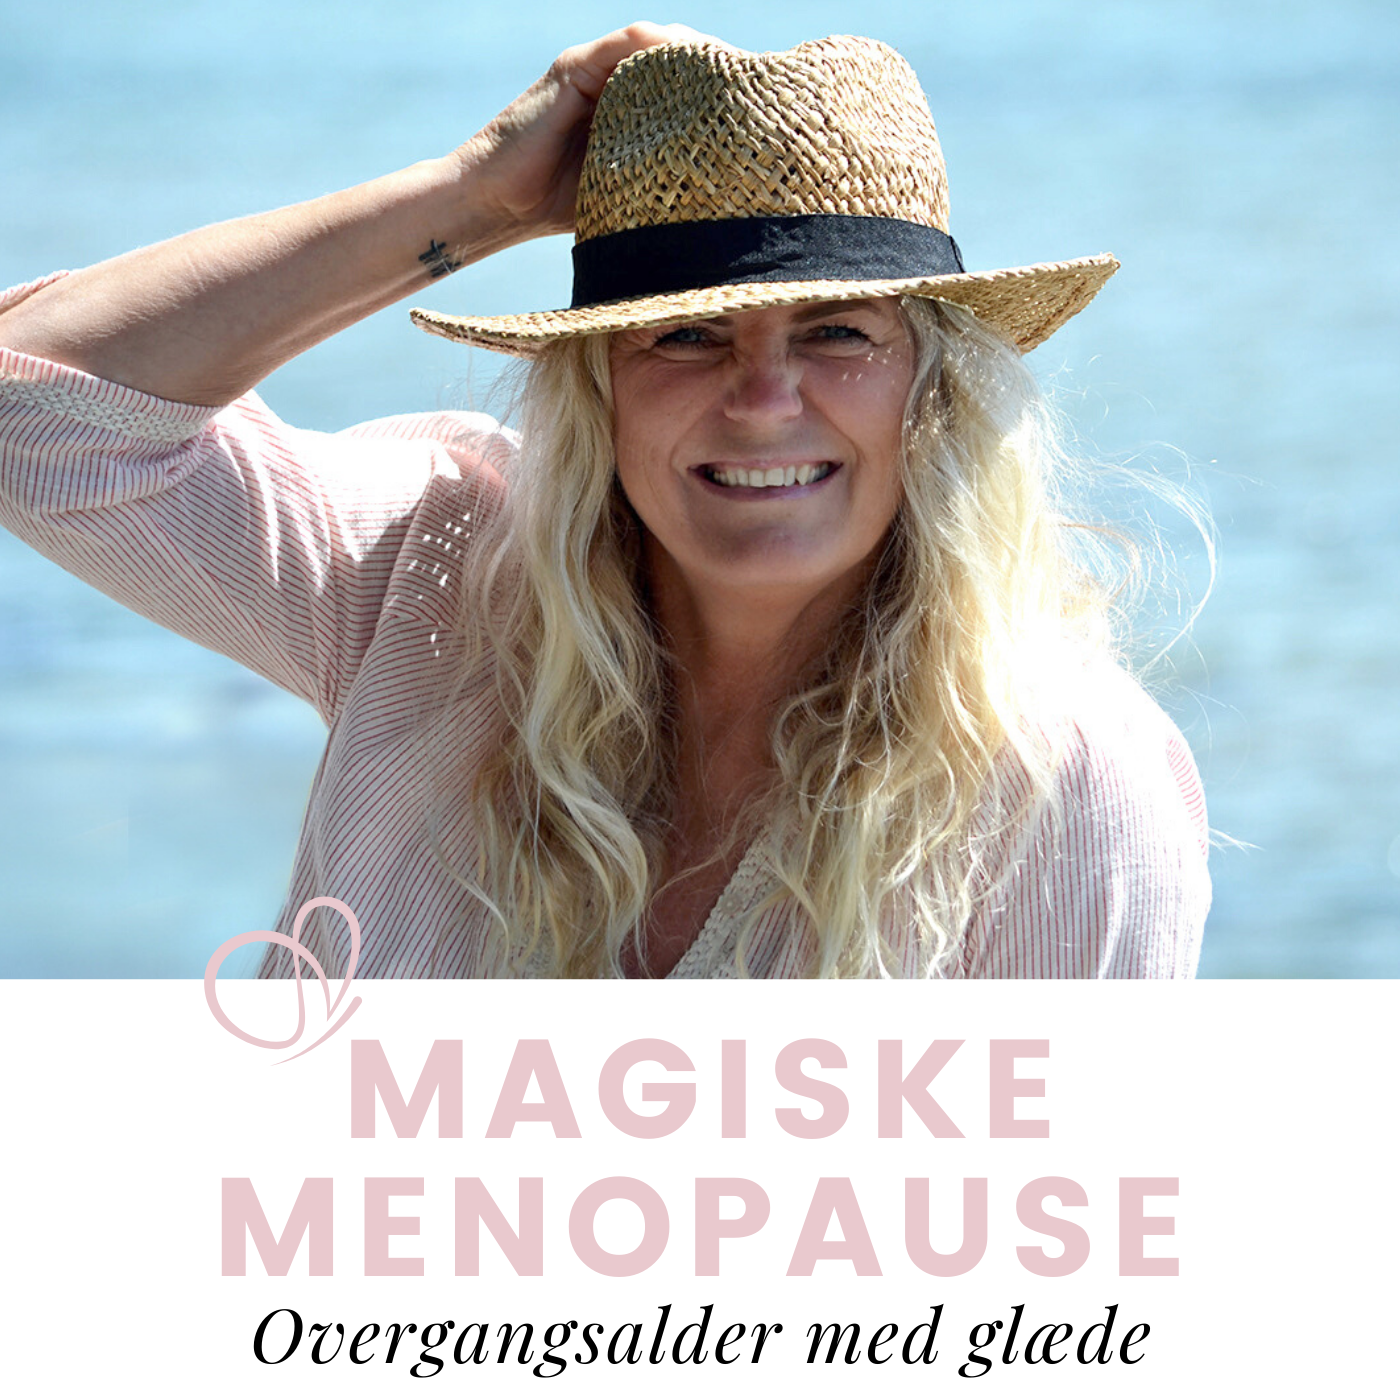 Magiske menopause podcast